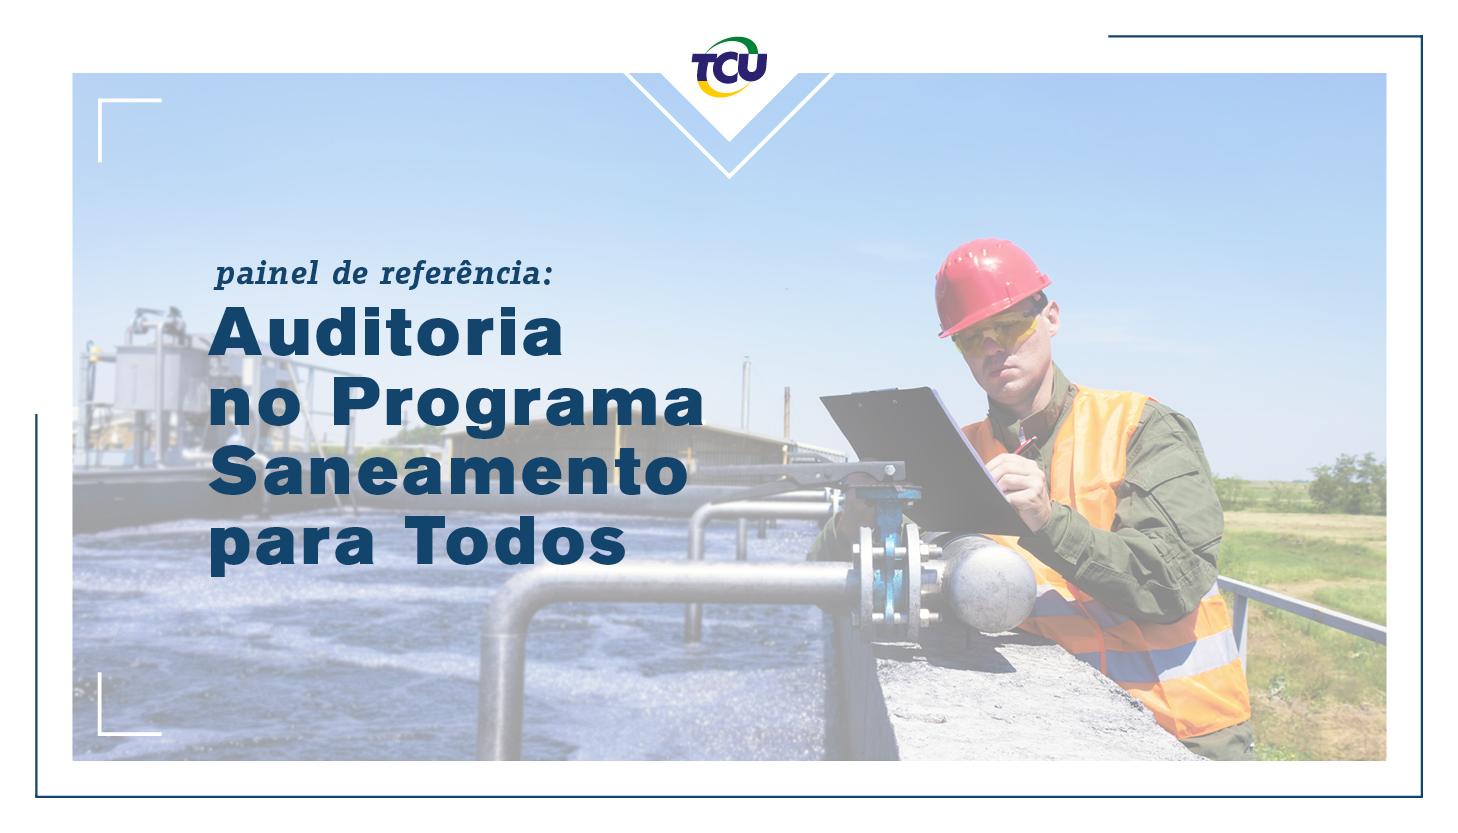 Webinario_Saneamento_UniaoNews_Semdata.jpg